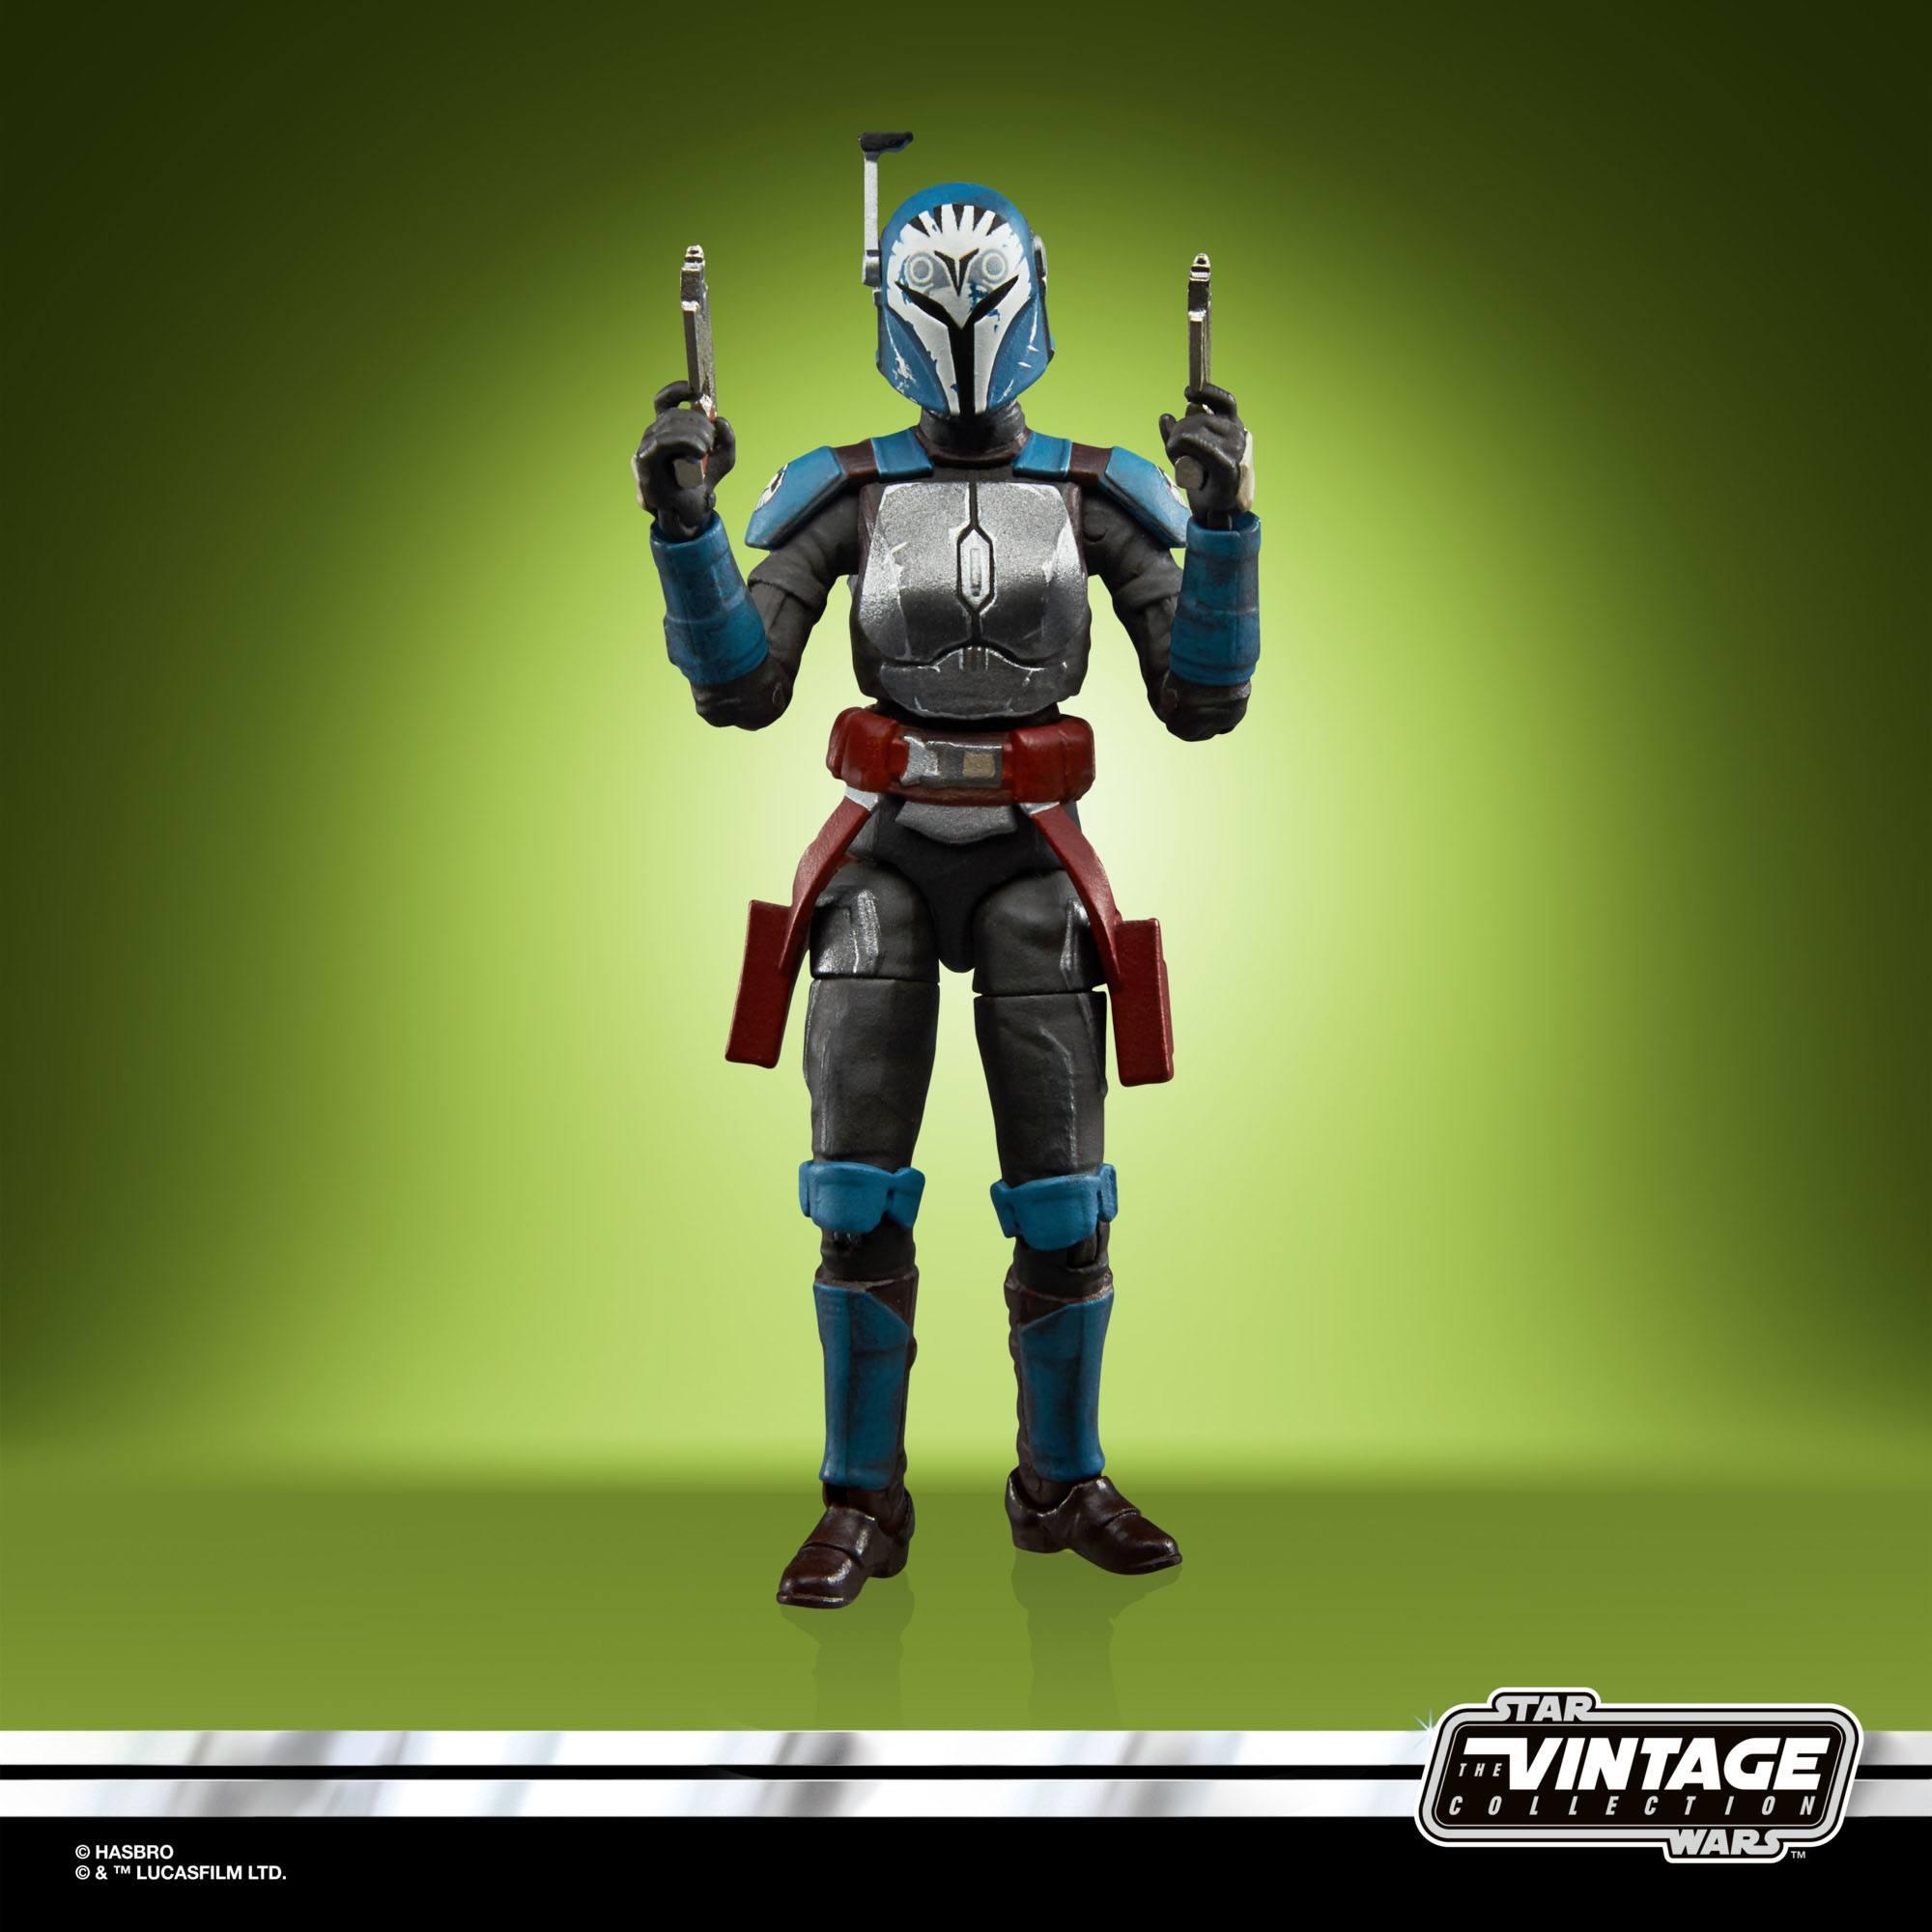 Star Wars The Mandalorian Vintage Collection Actionfigur 2022 Bo-Katan Kryze 10 cm HASF4465 5010993957972